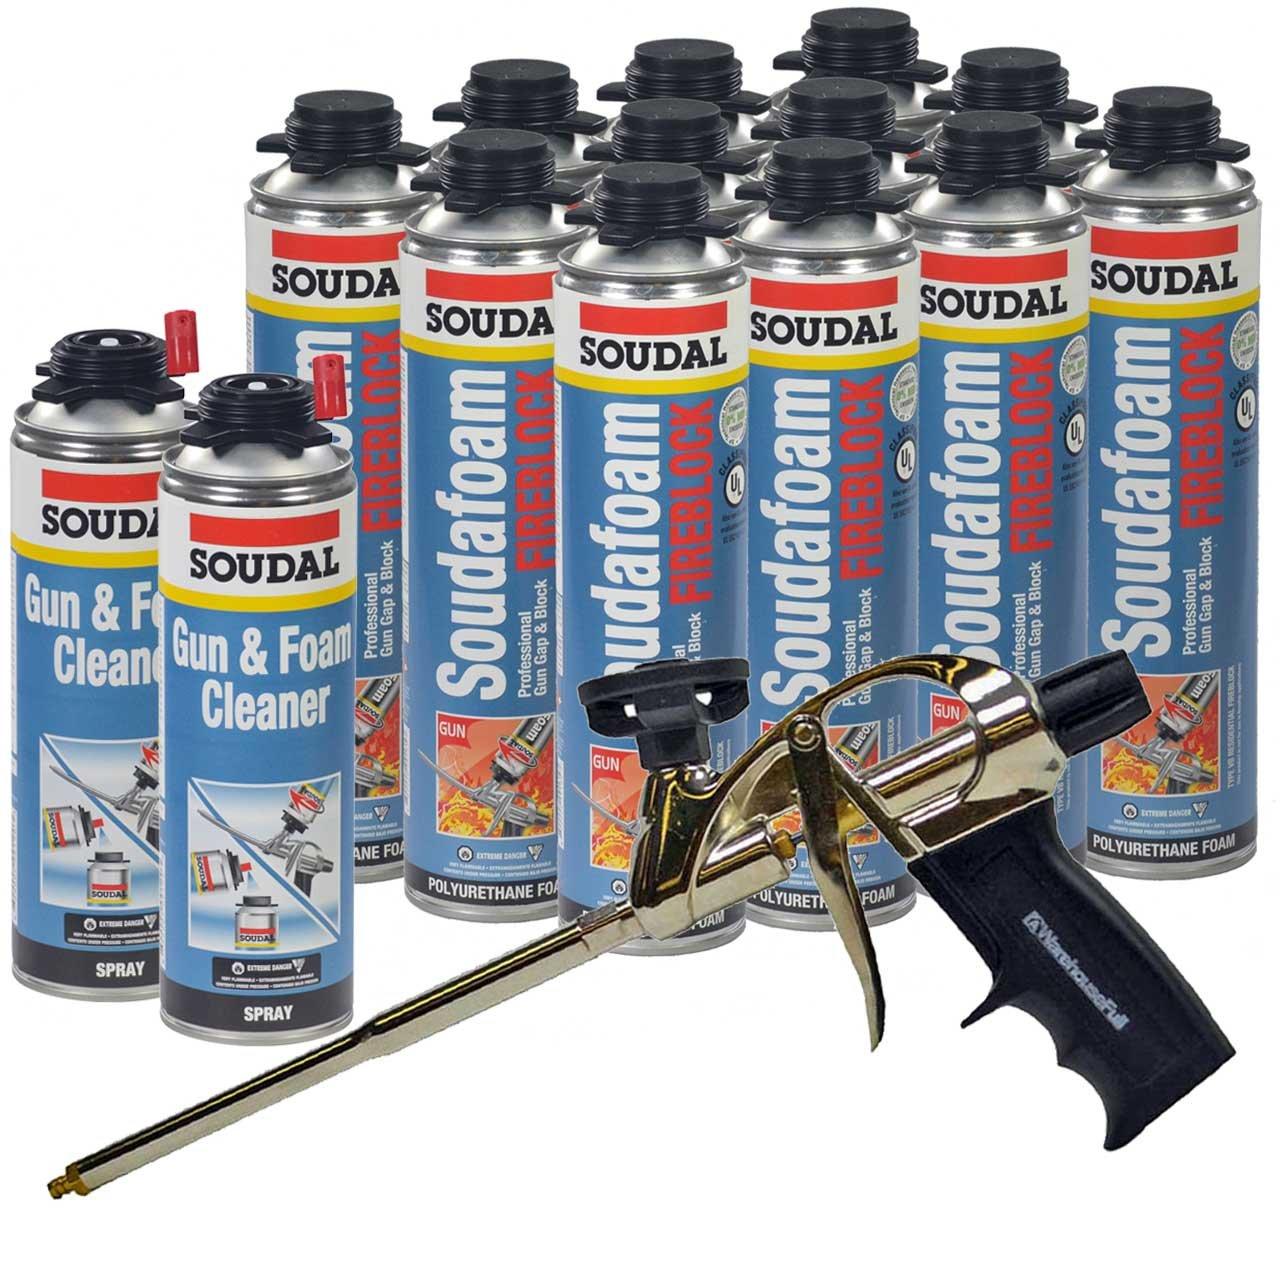 Soudal PRO Fireblock Foam Sealant 24 oz can (12 Cans), Professional Foam Gun, 2 cans of gun cleaner